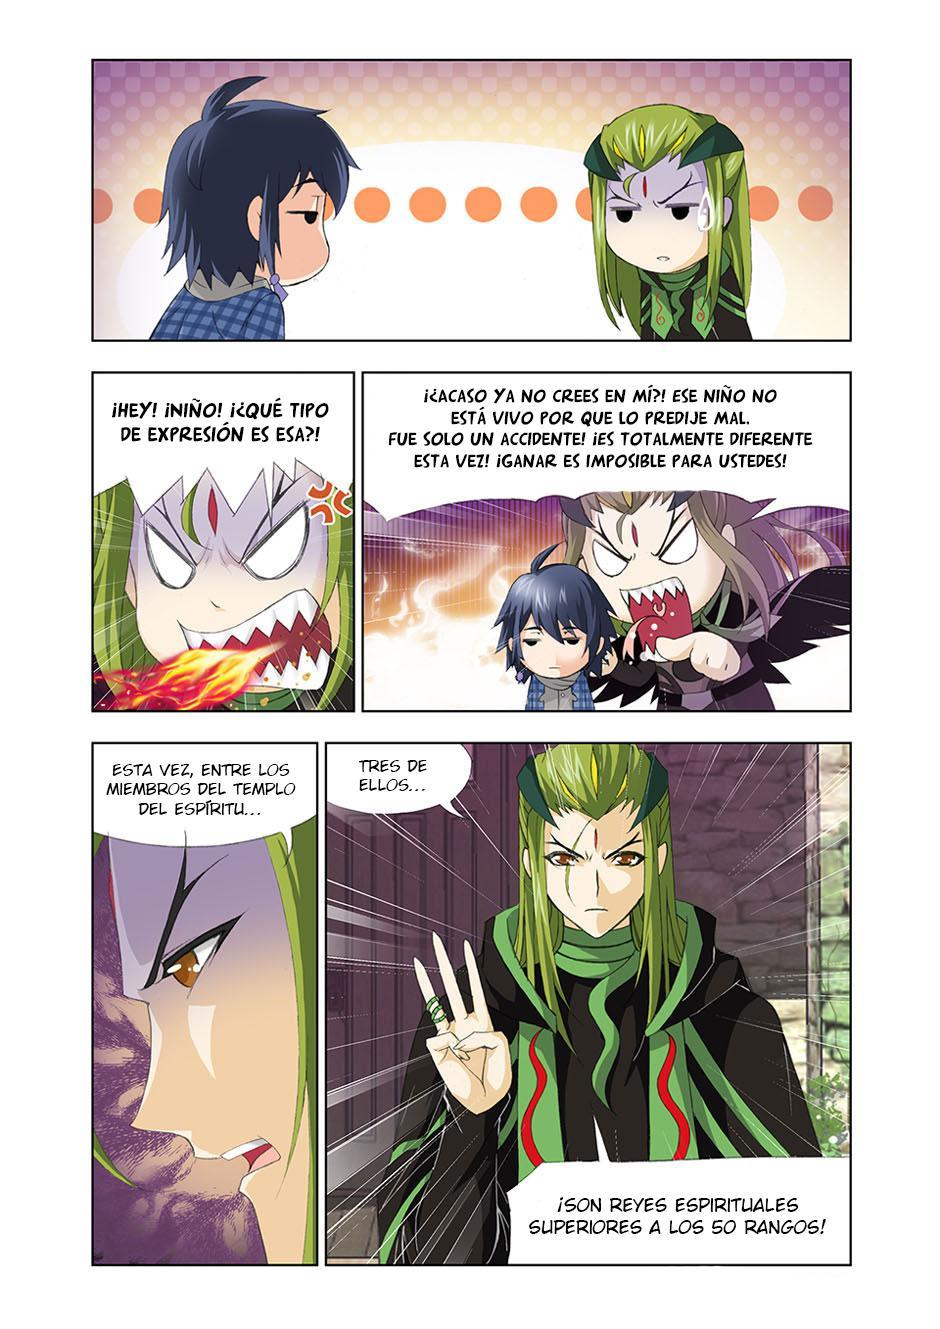 http://c5.ninemanga.com/es_manga/18/16210/417006/4a342b9eaf180eaf3c3e068570ae3854.jpg Page 4